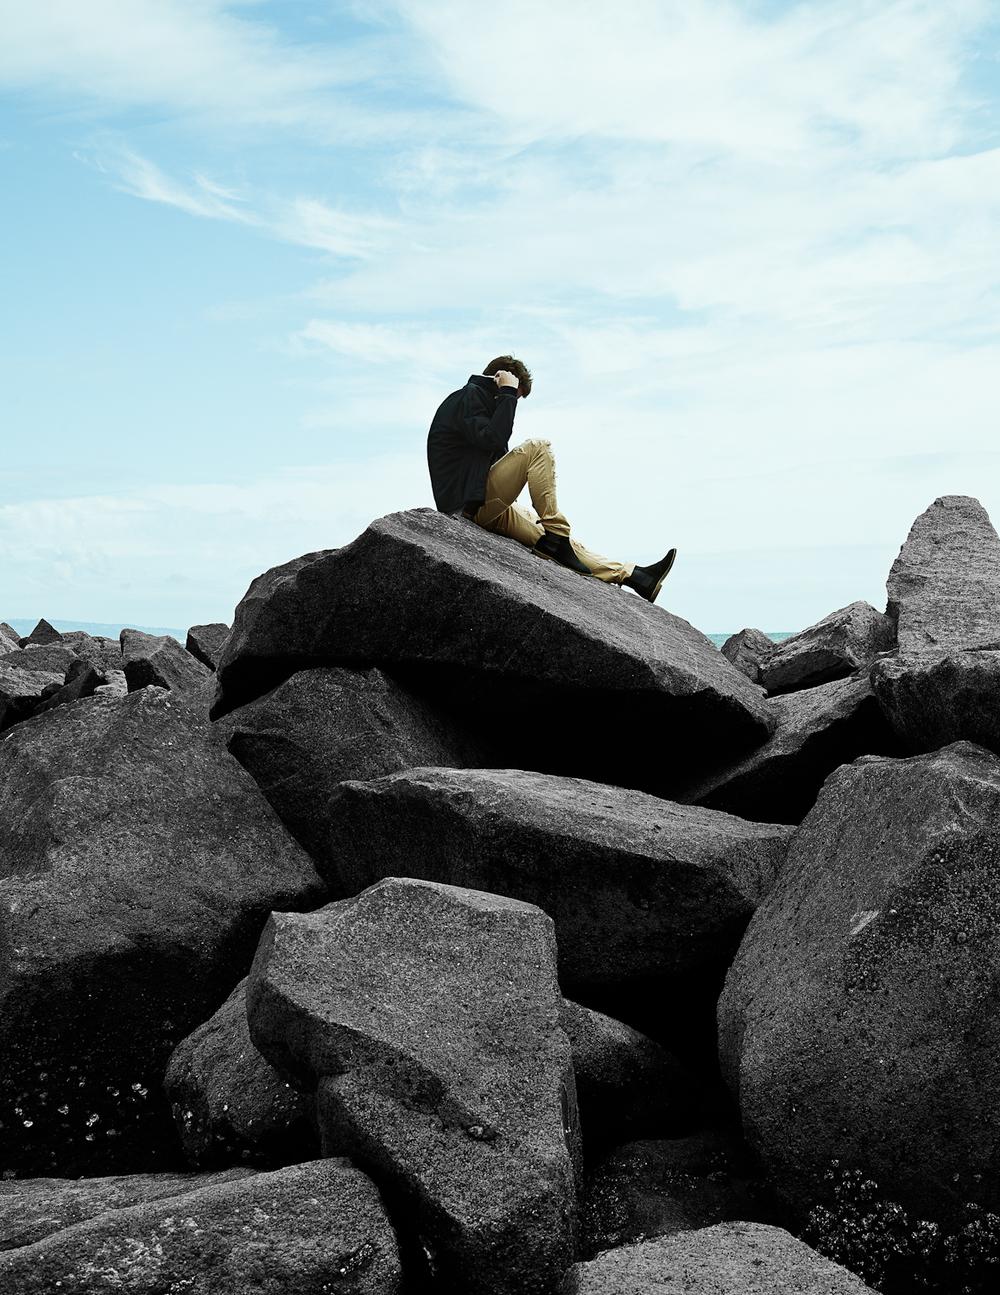 Lifestyle-Denim-Campaign-Kat-Kaye090_ROCKSTAR_KAT_KAYE-Edit.jpg